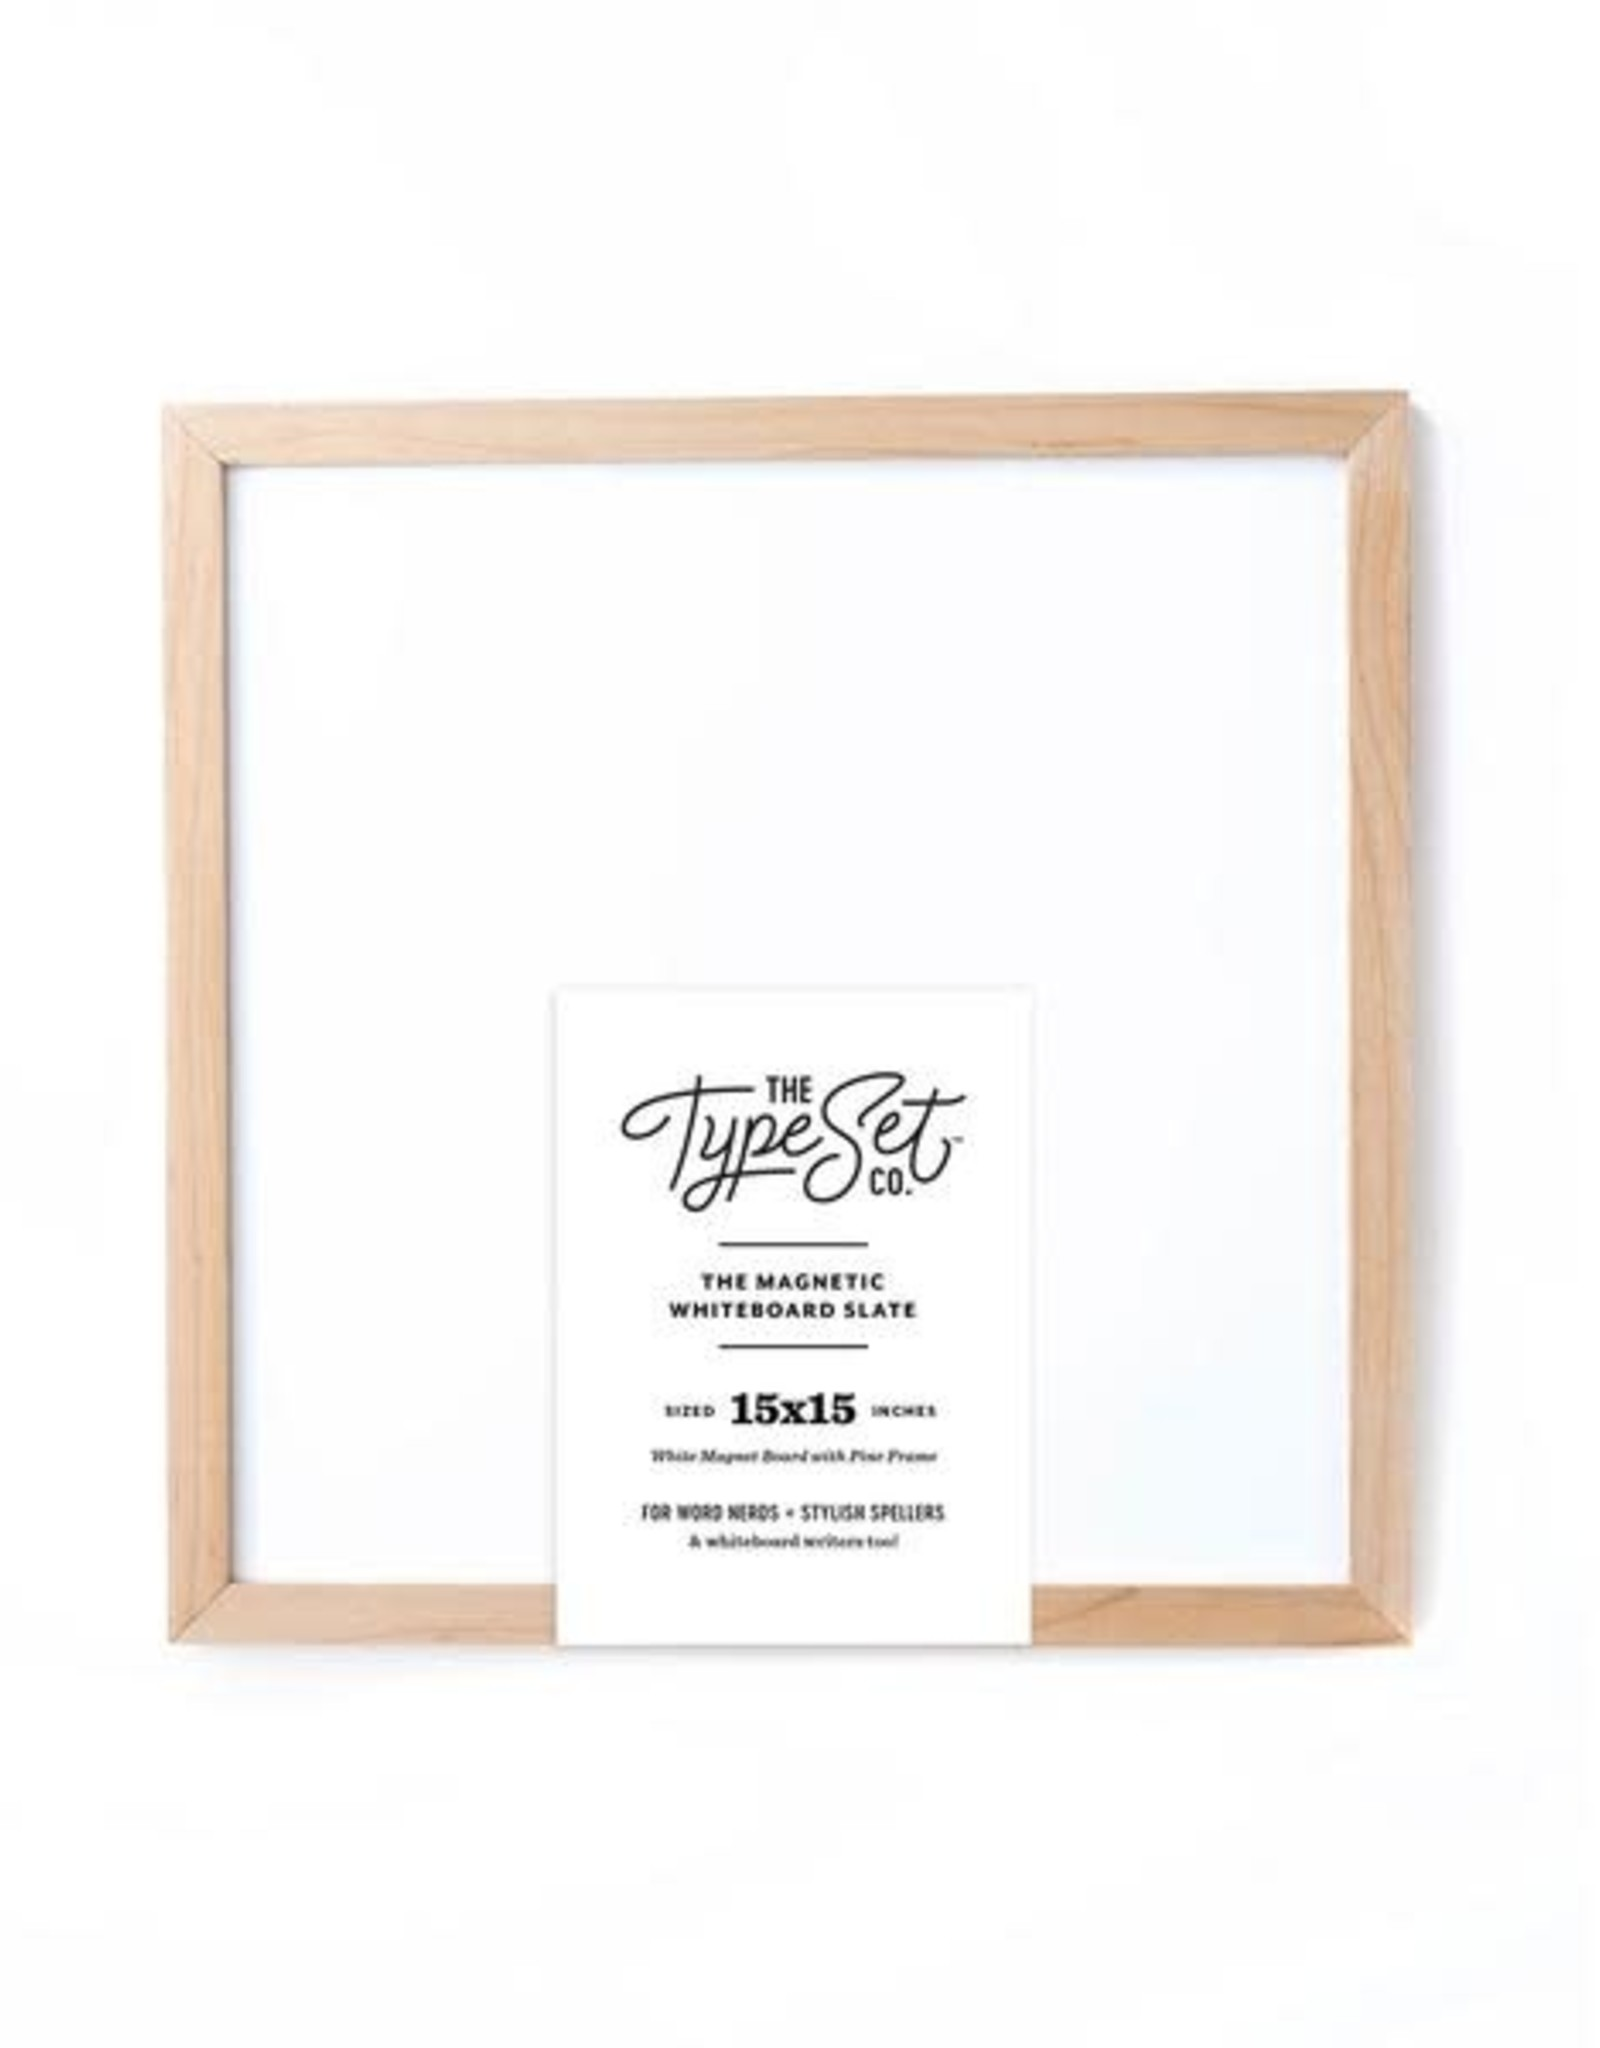 The Type Set Whiteboard